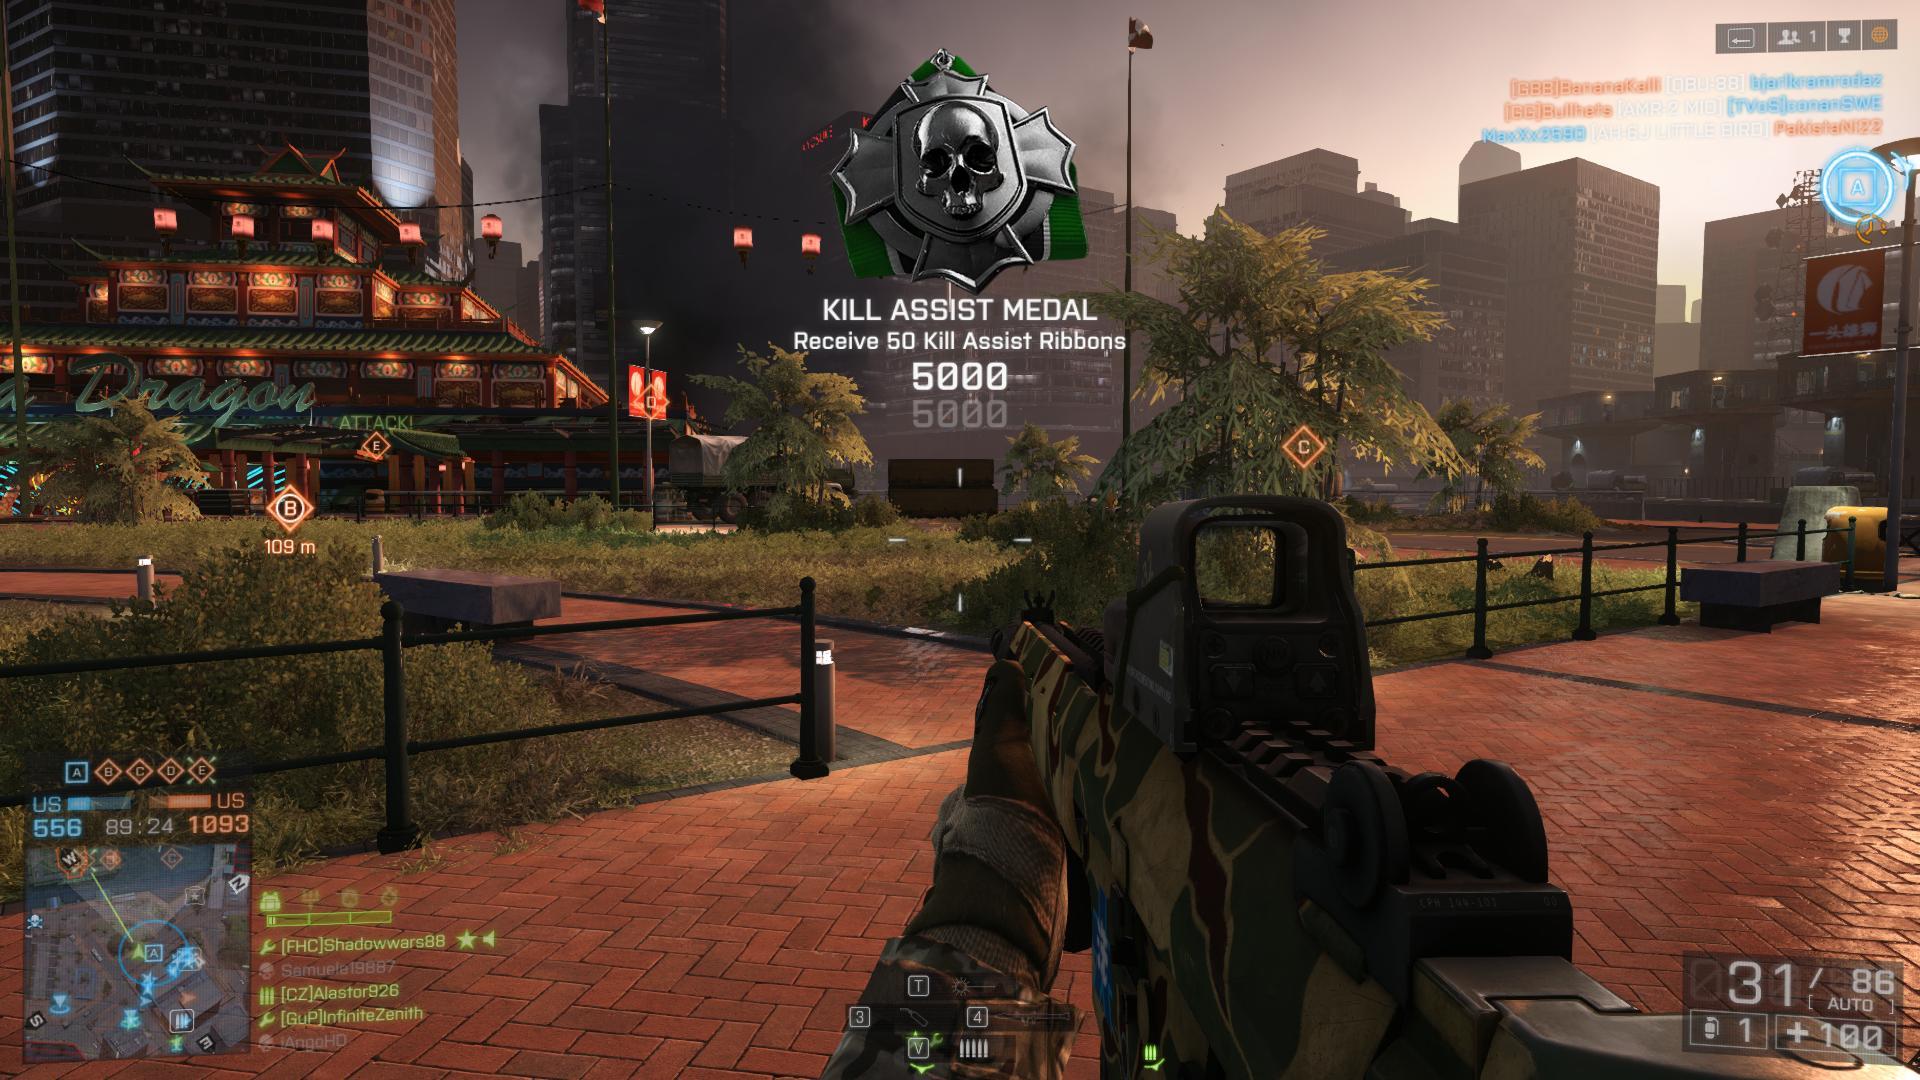 Battlefield: hardline | The Infinite Zenith